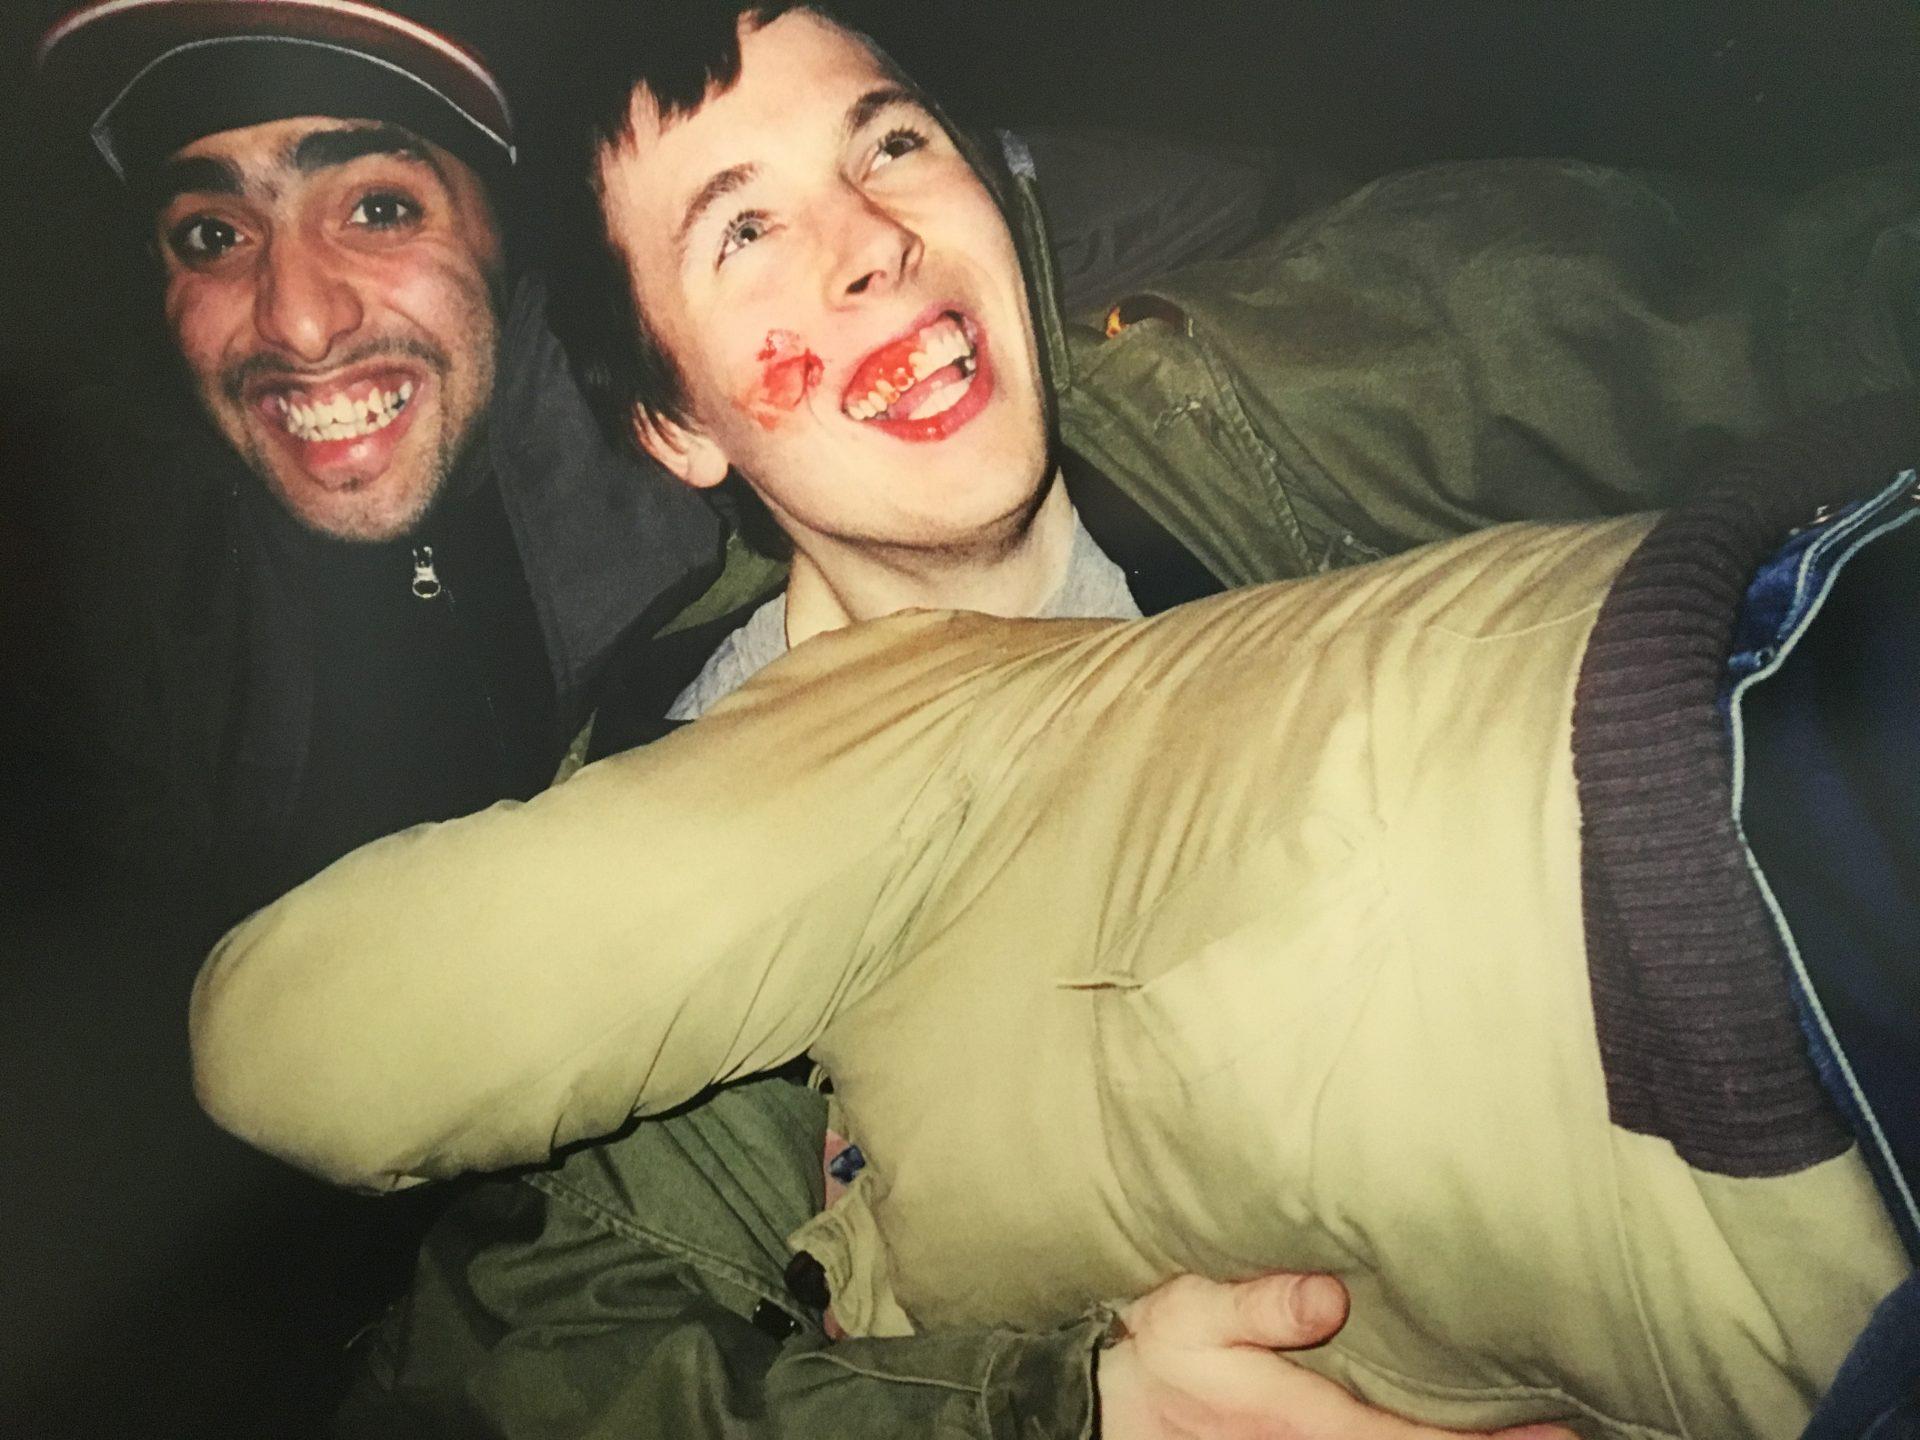 Ryan-McGinley-Sucker-Punch